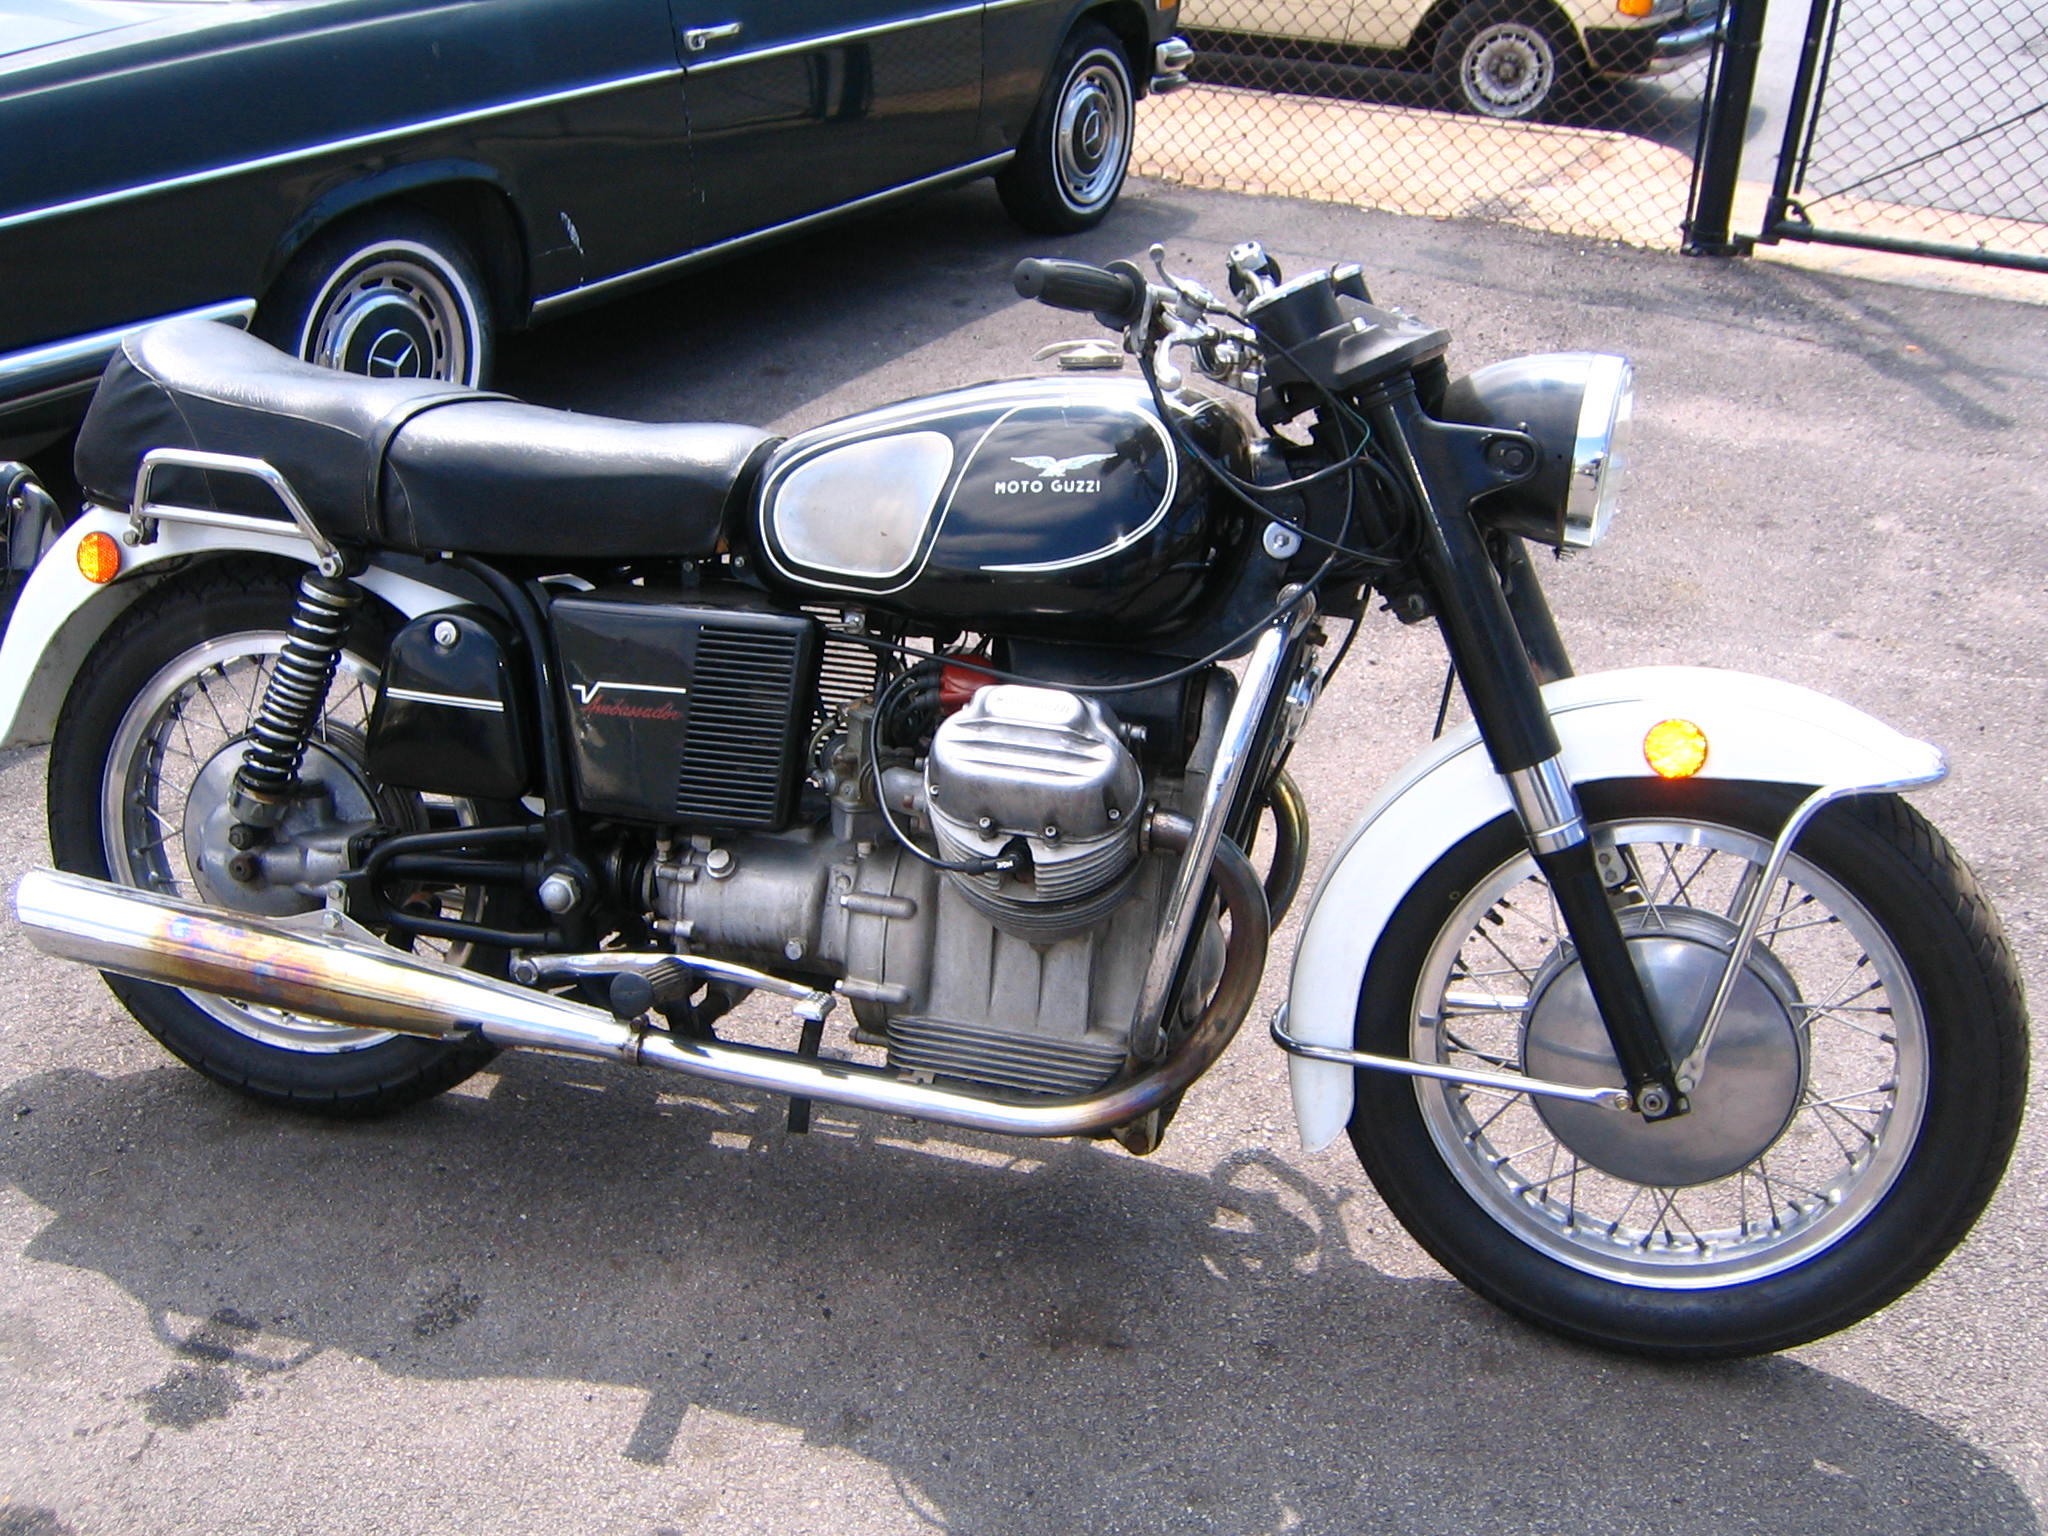 1971 moto guzzi 750 ambassador